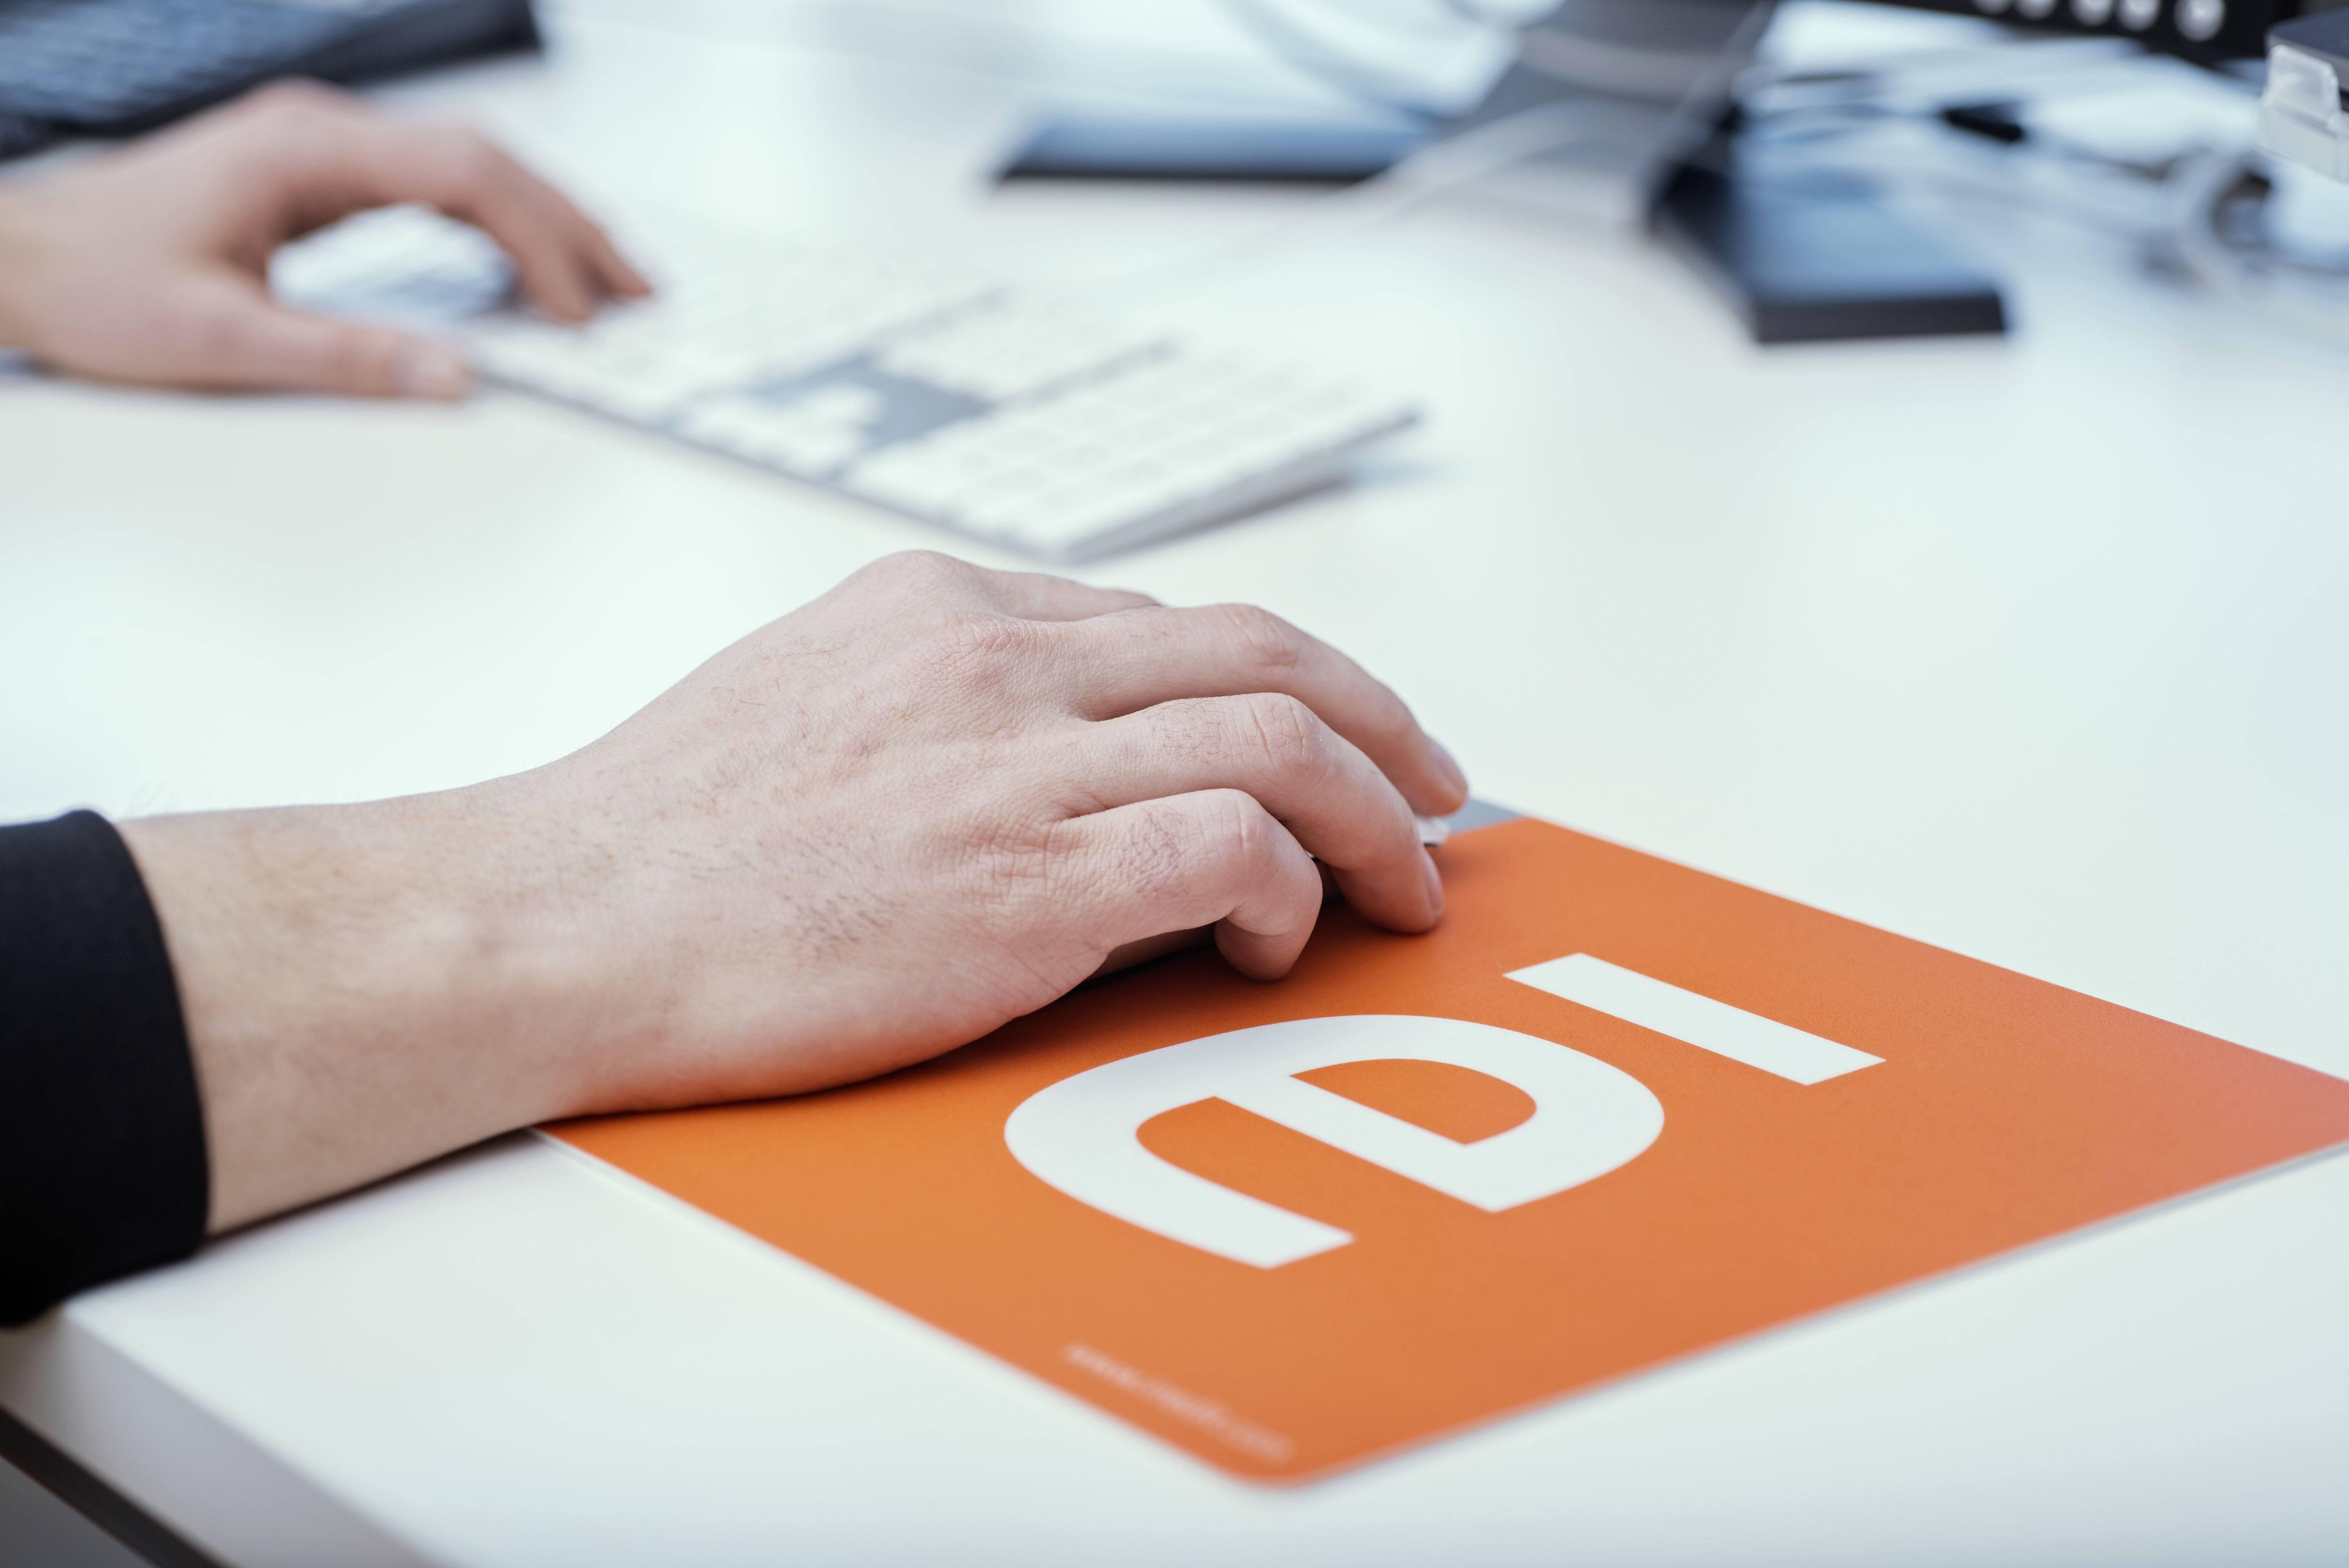 print design software